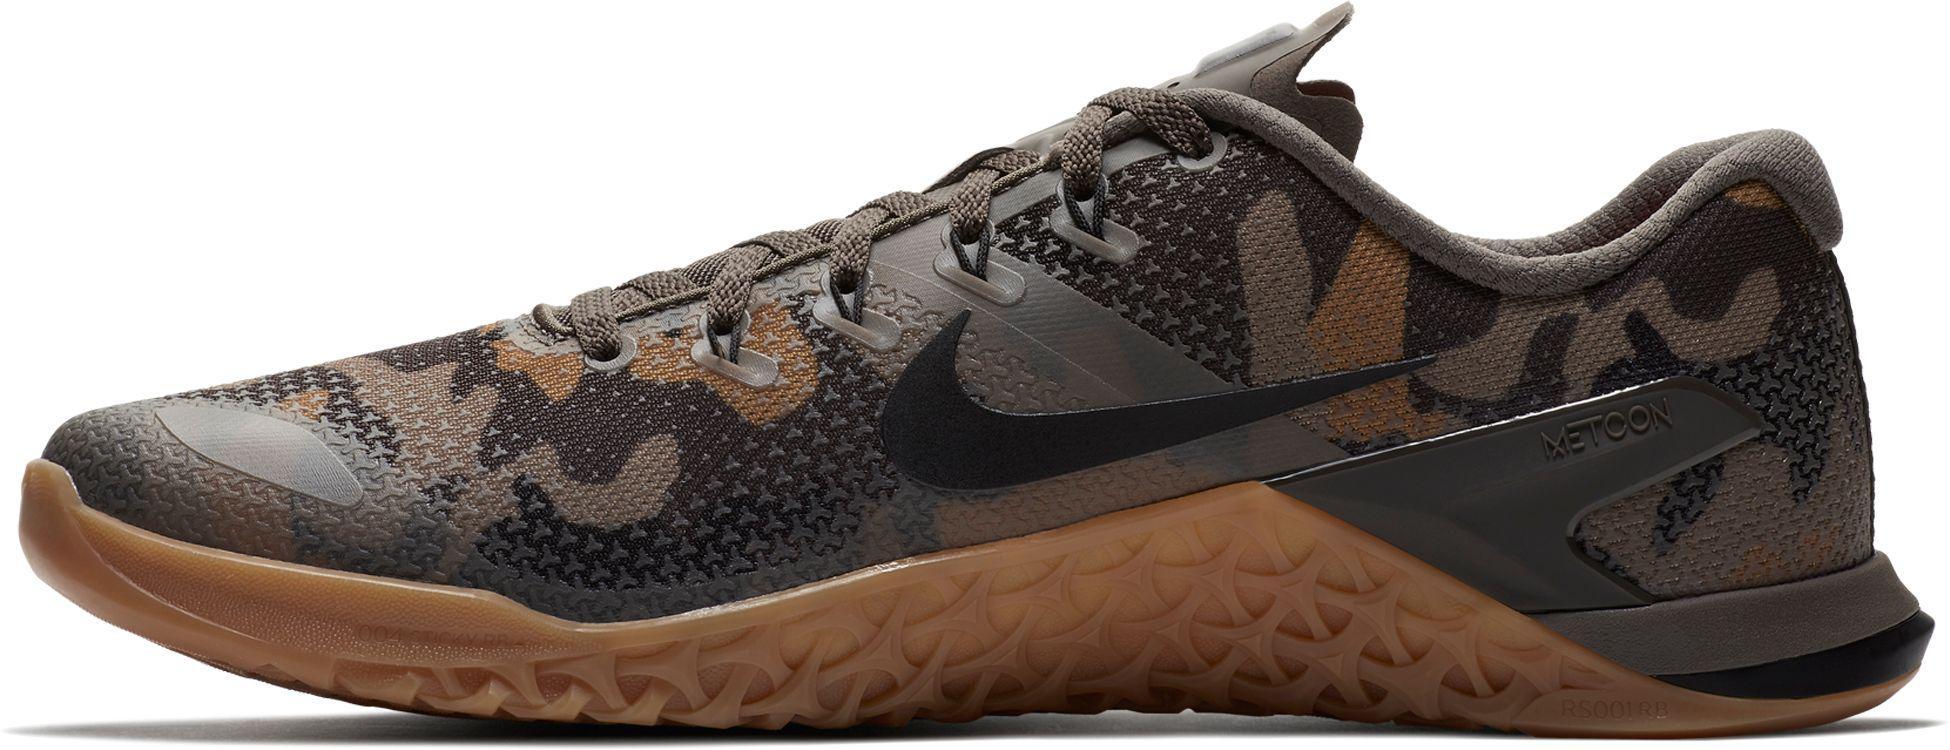 Nike Rubber Metcon 4 Ah7453 207